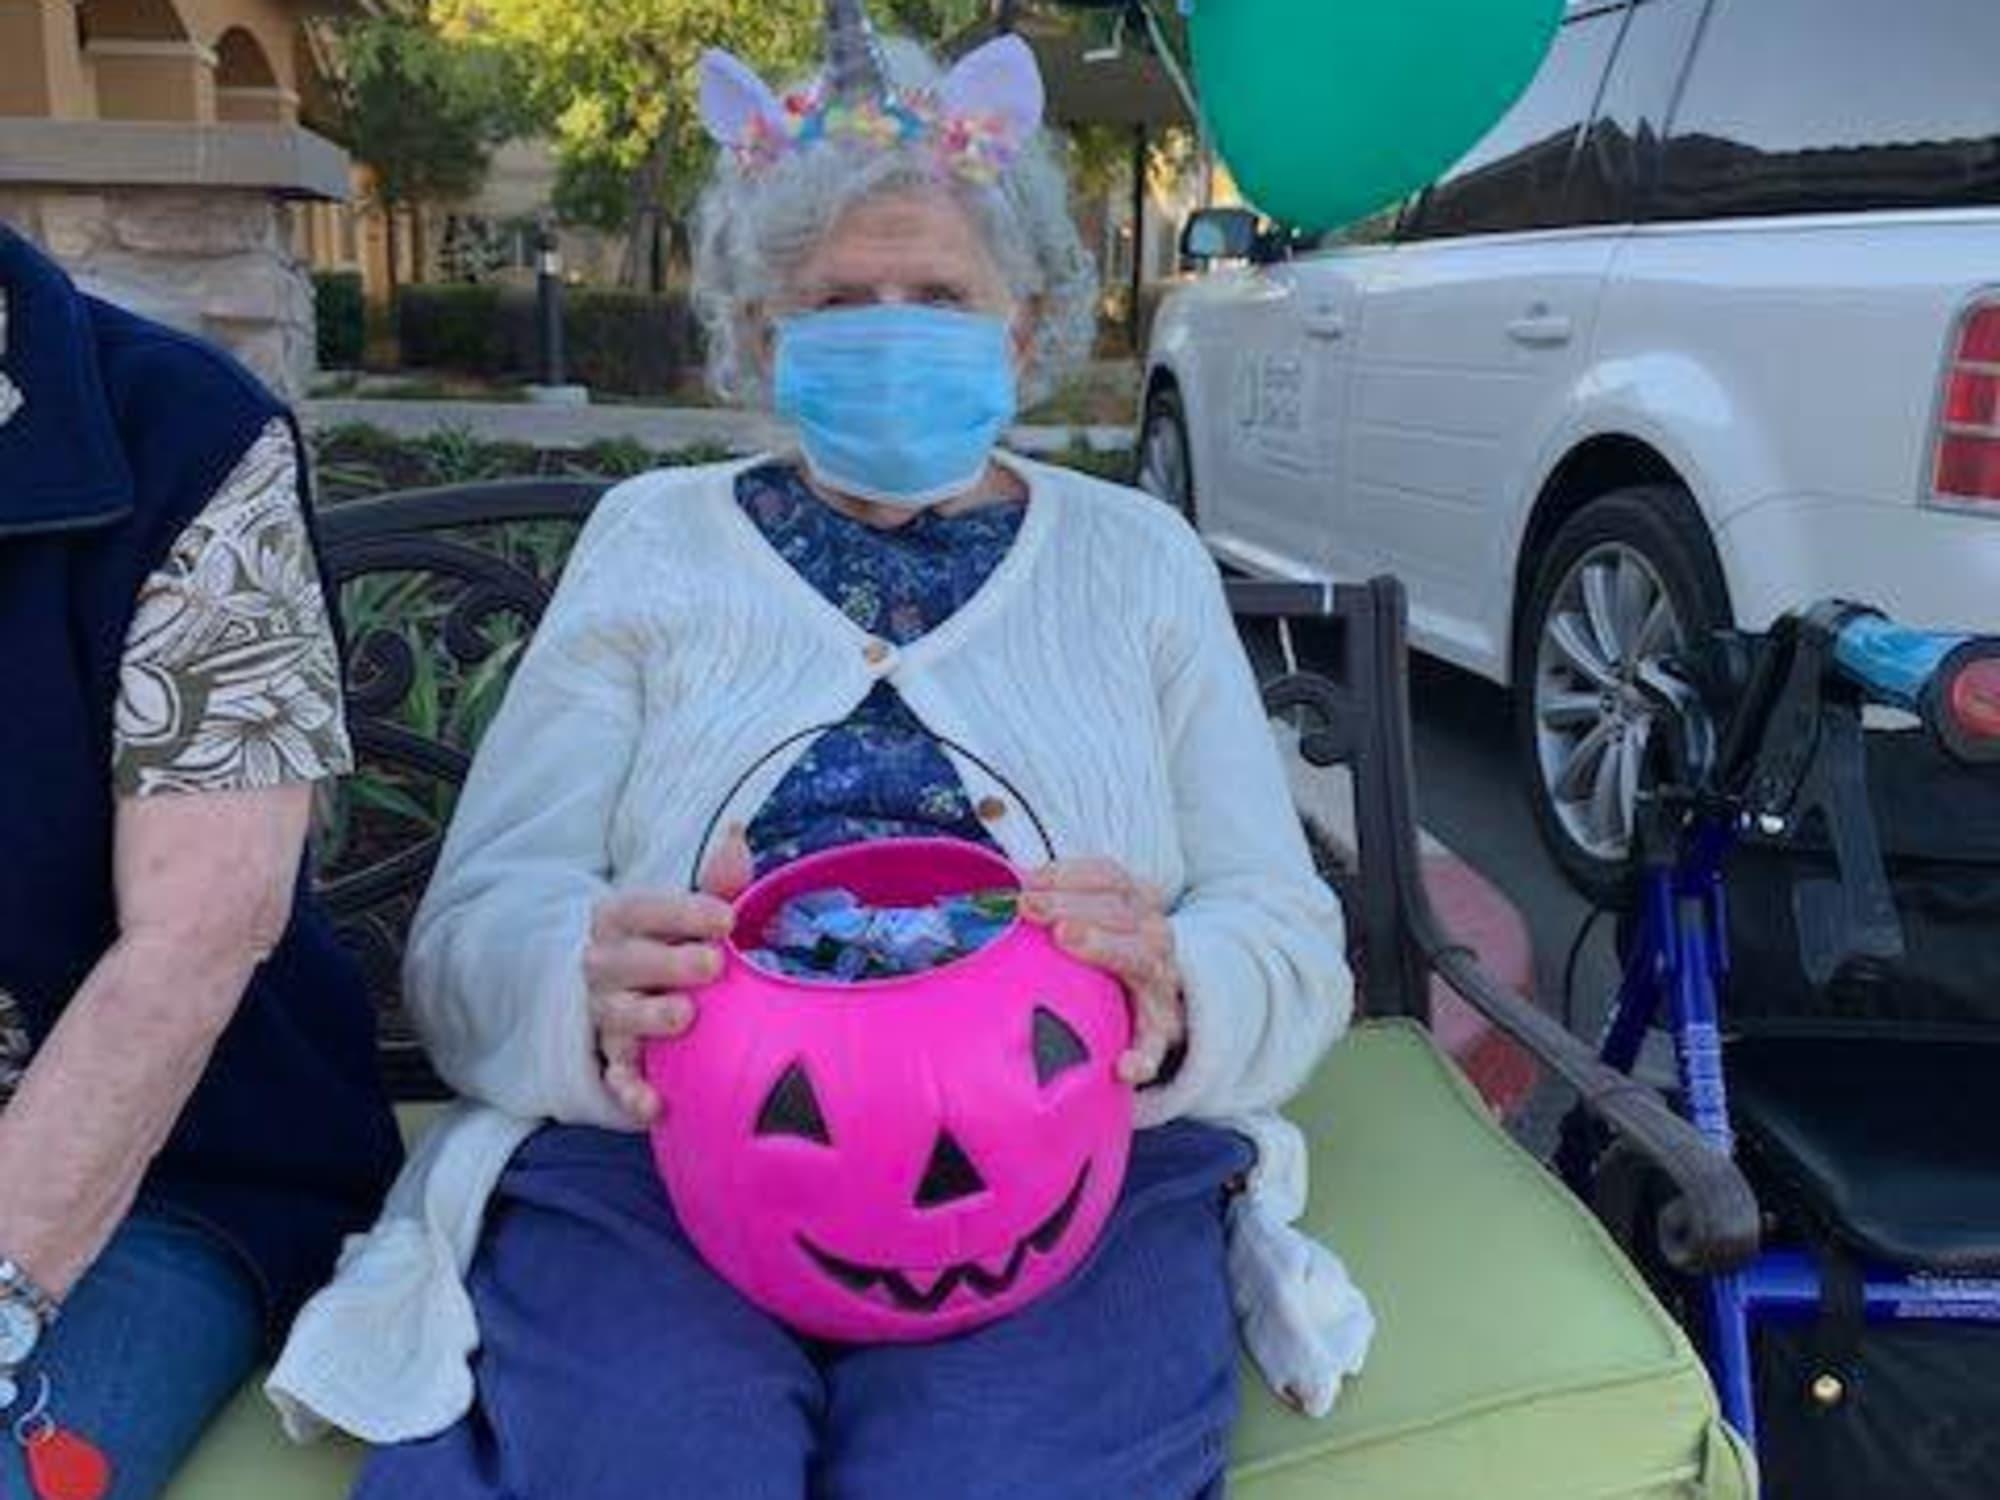 Halloween candy at Estancia Del Sol in Corona, CA